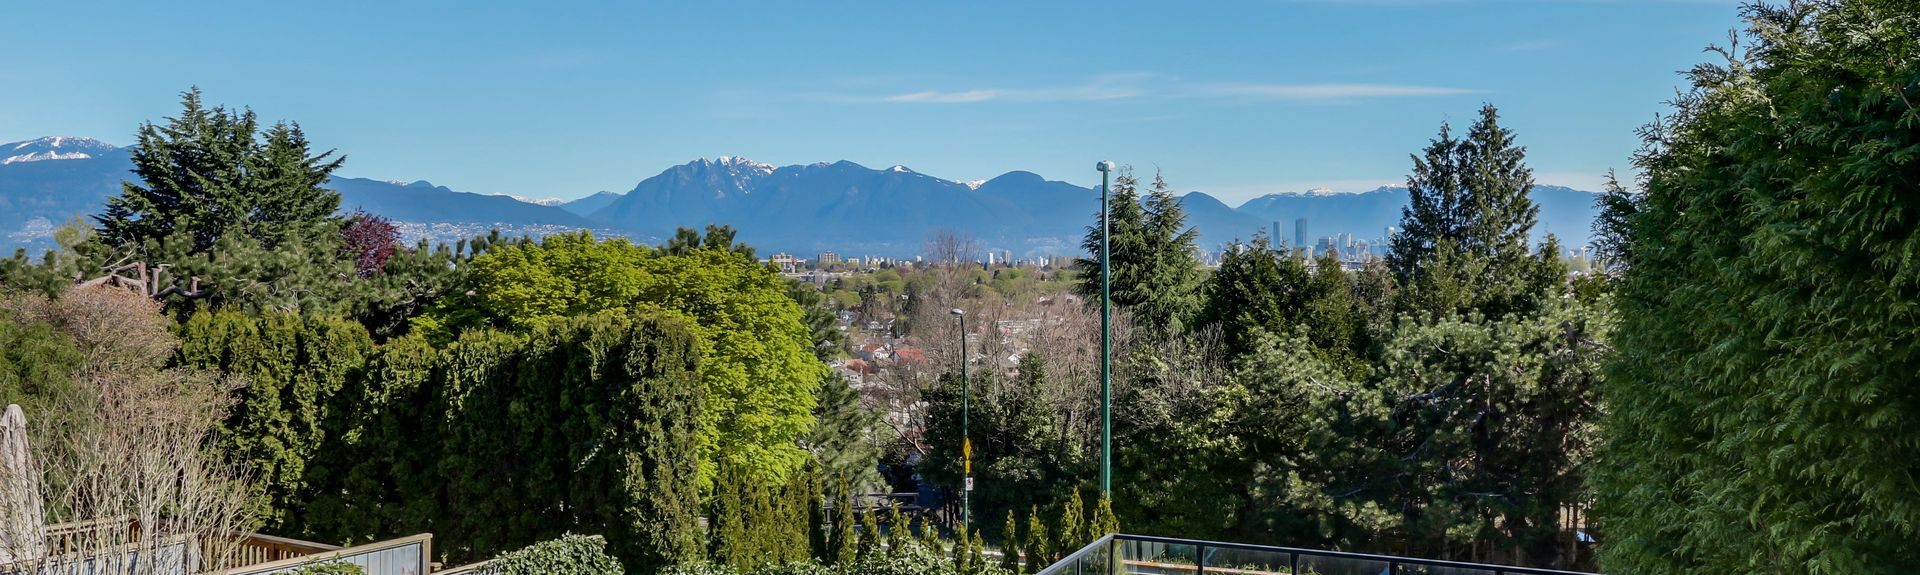 Kerrisdale, Vancouver, British Columbia, Canadá